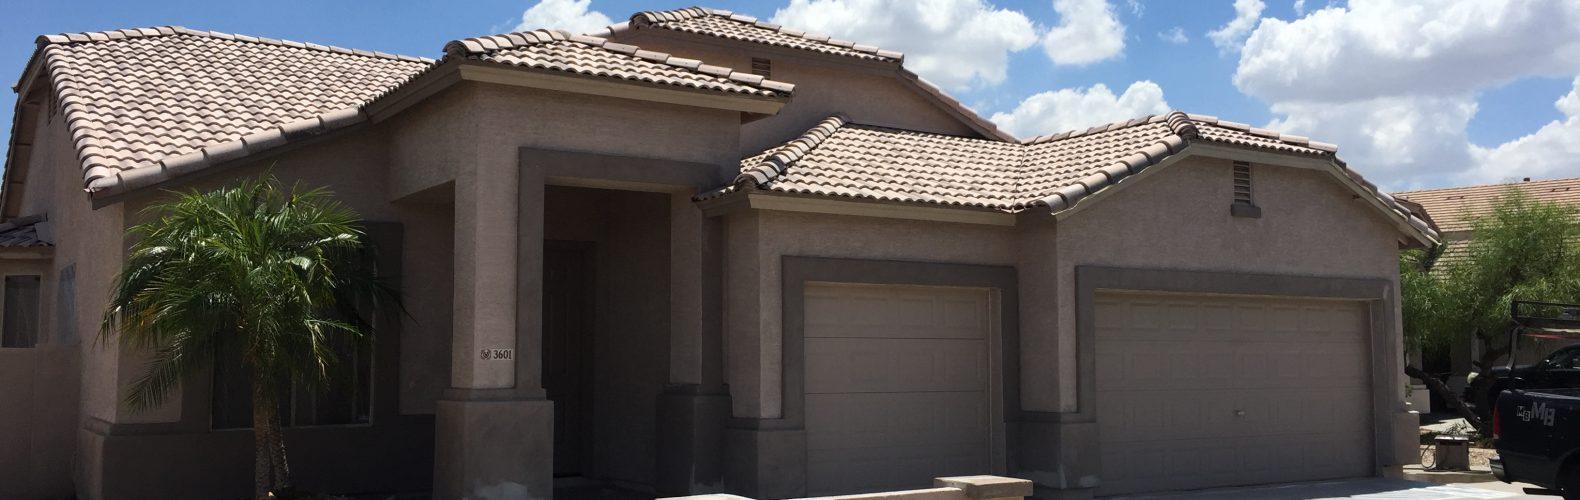 House painting near gilbert arizona